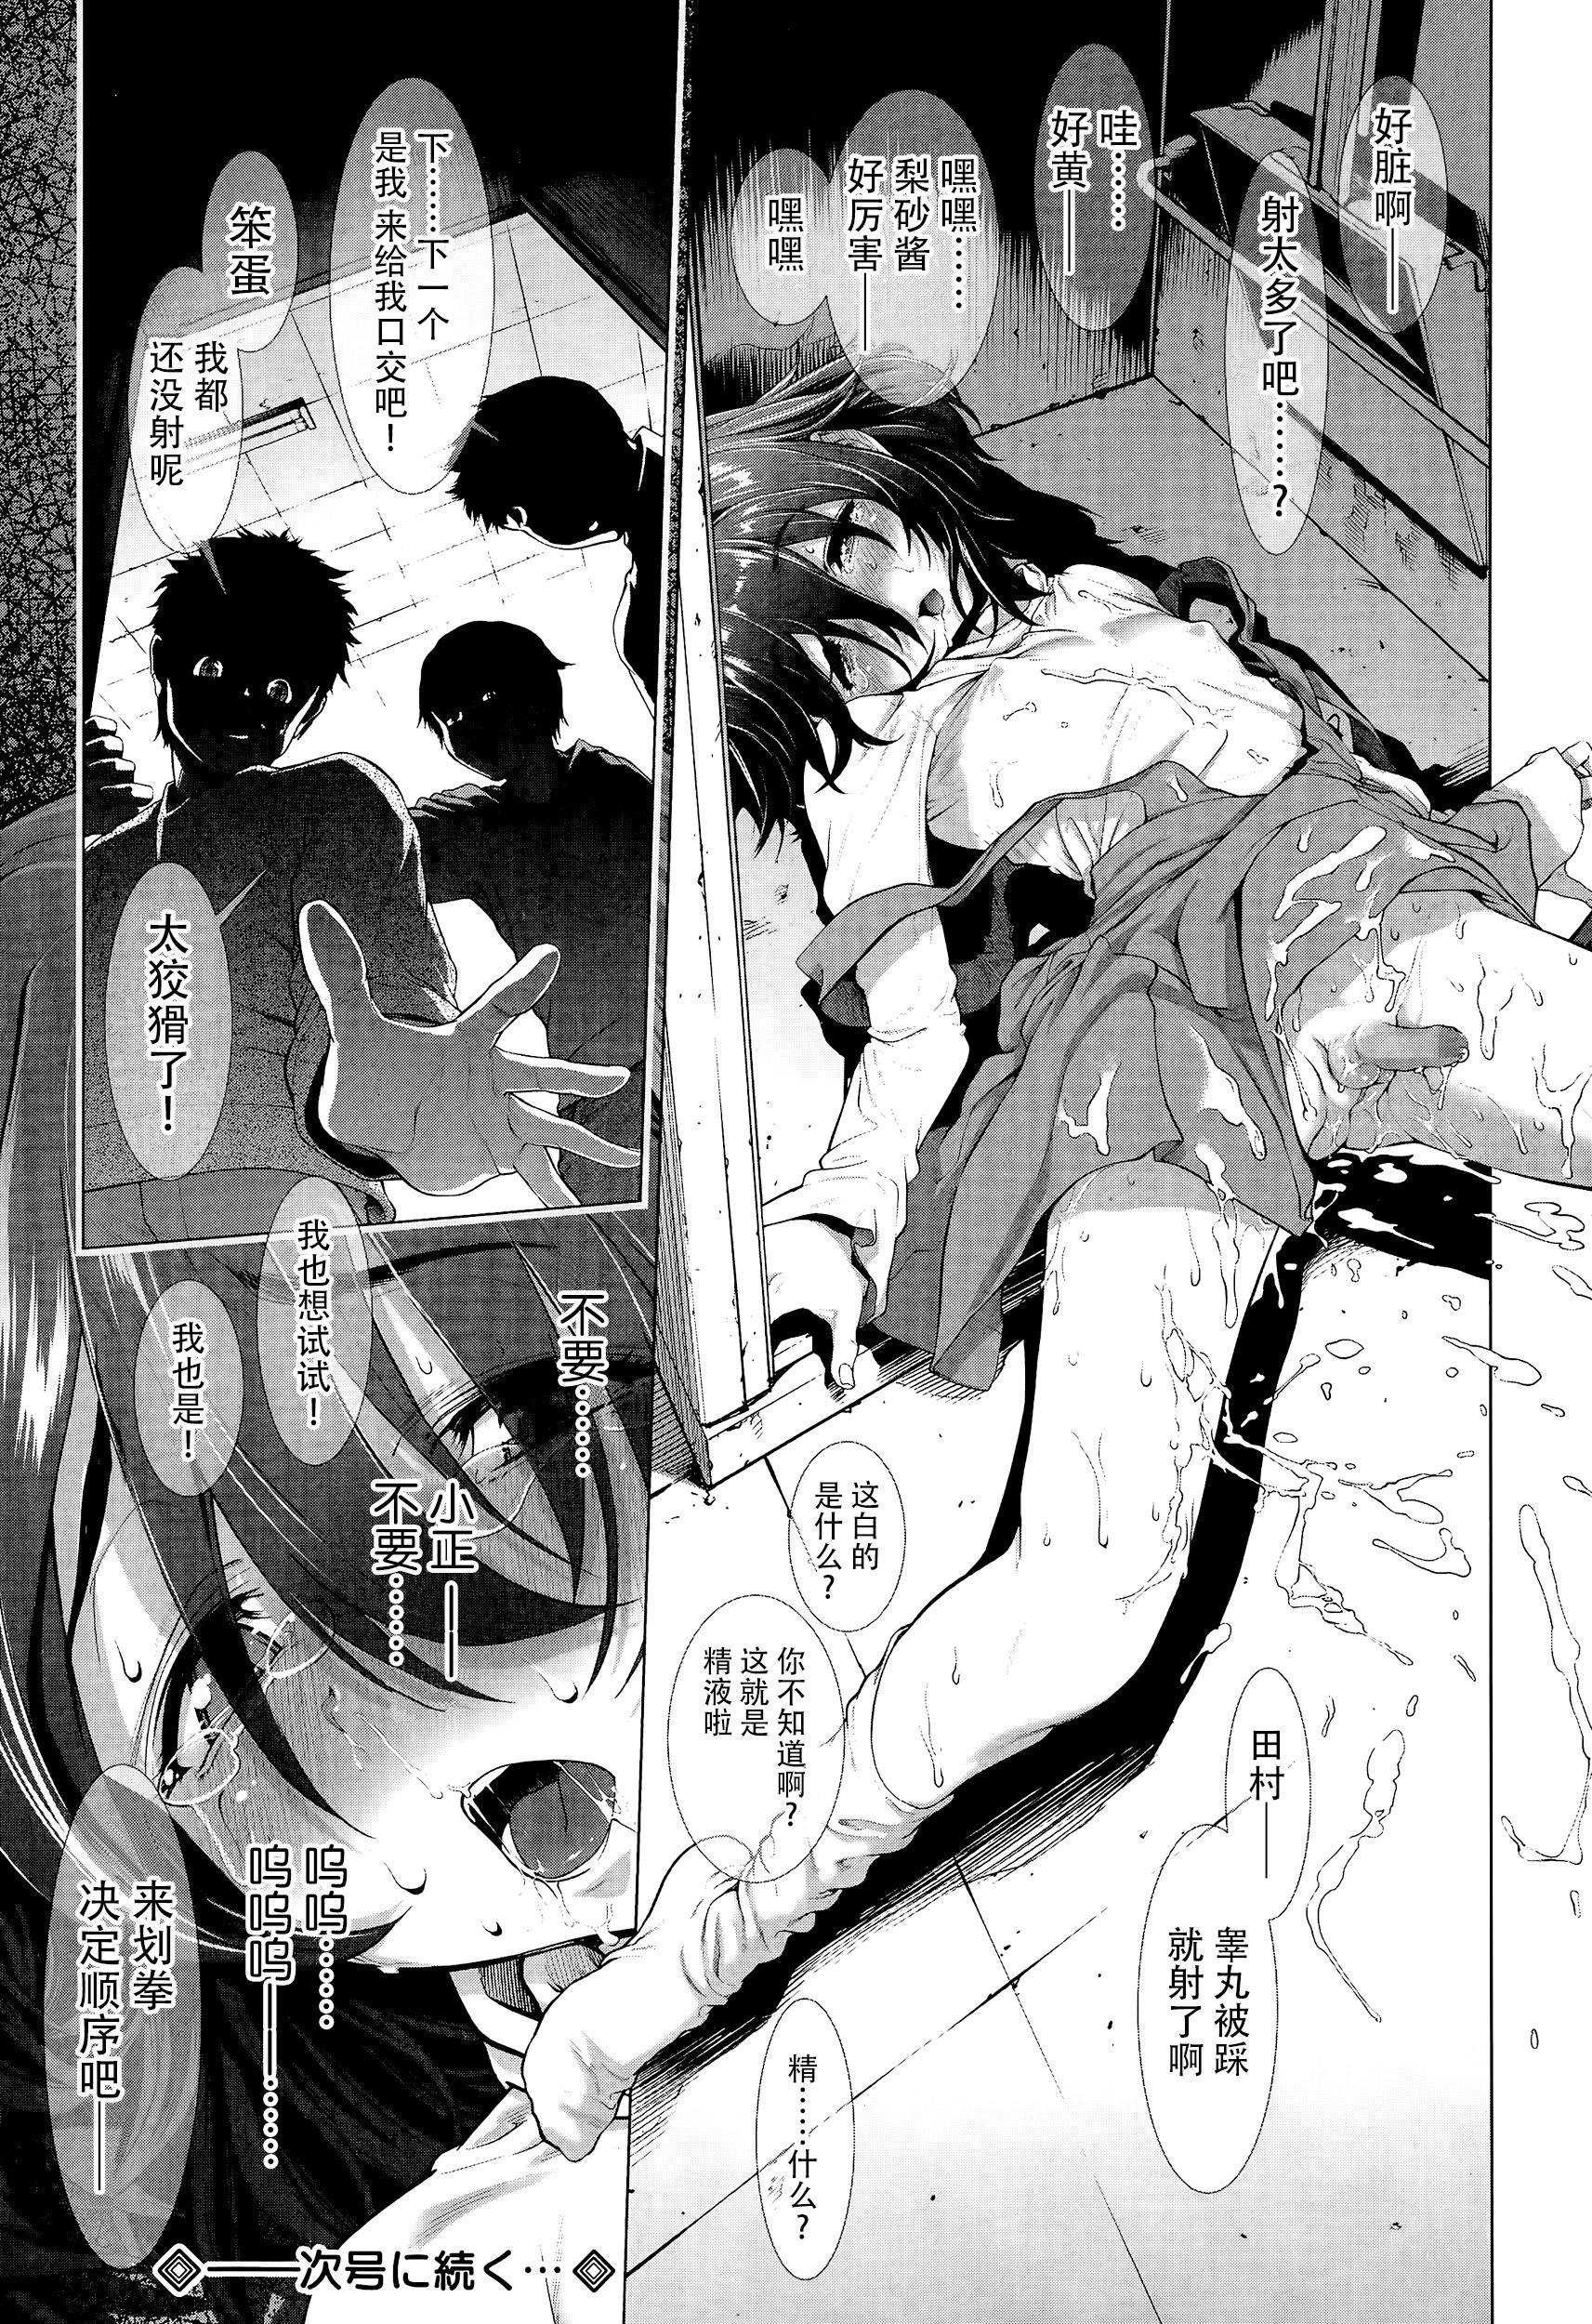 Chinpotsuki! Ijimerarekko ch.1-5 32